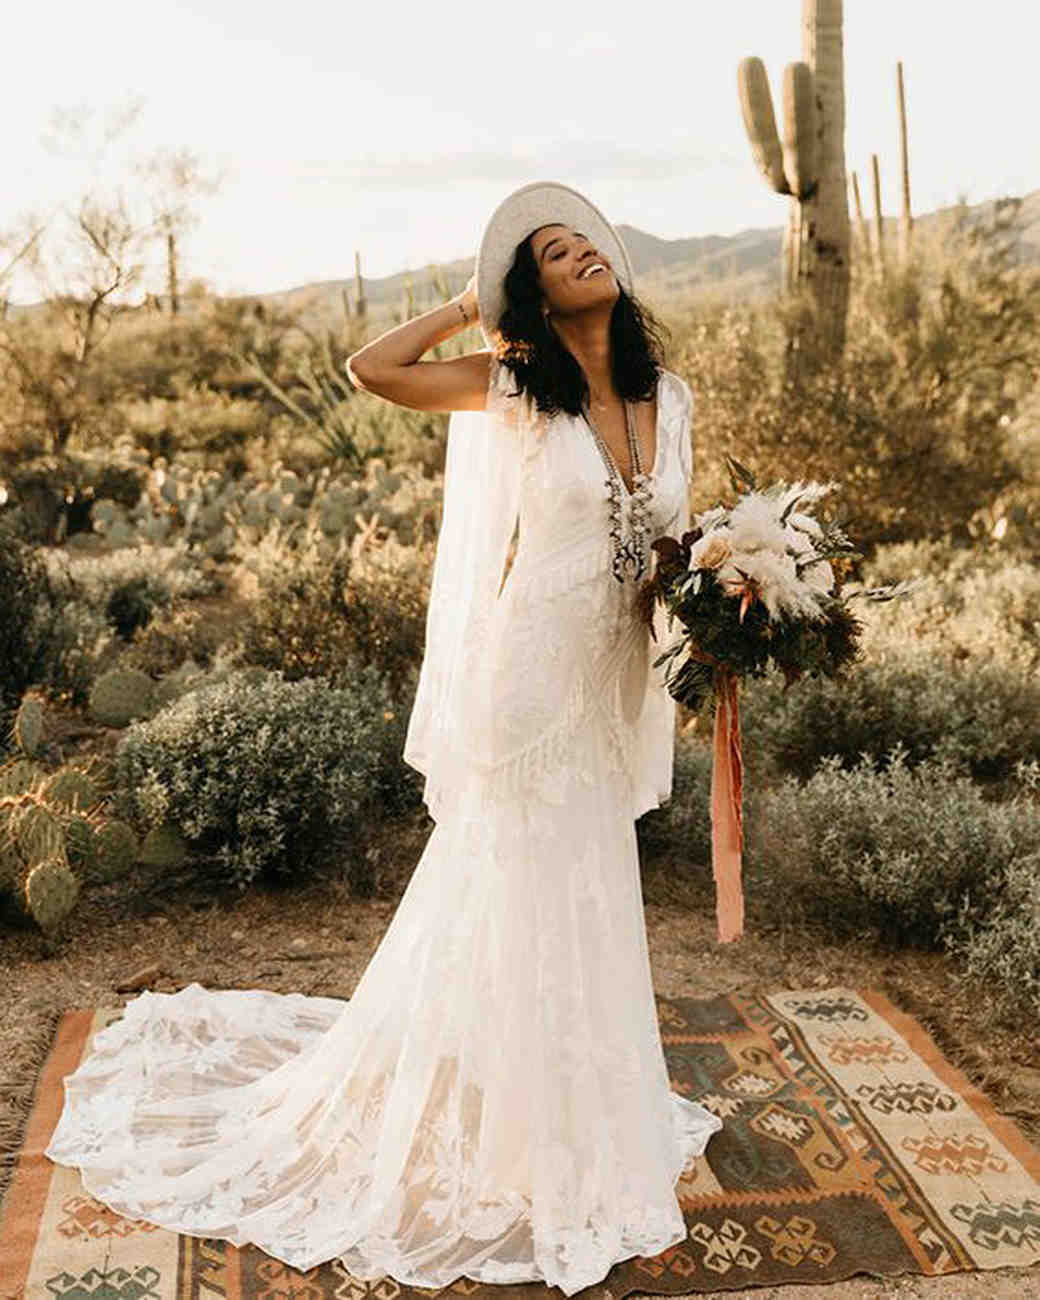 destination wedding dress hoho-chic lace